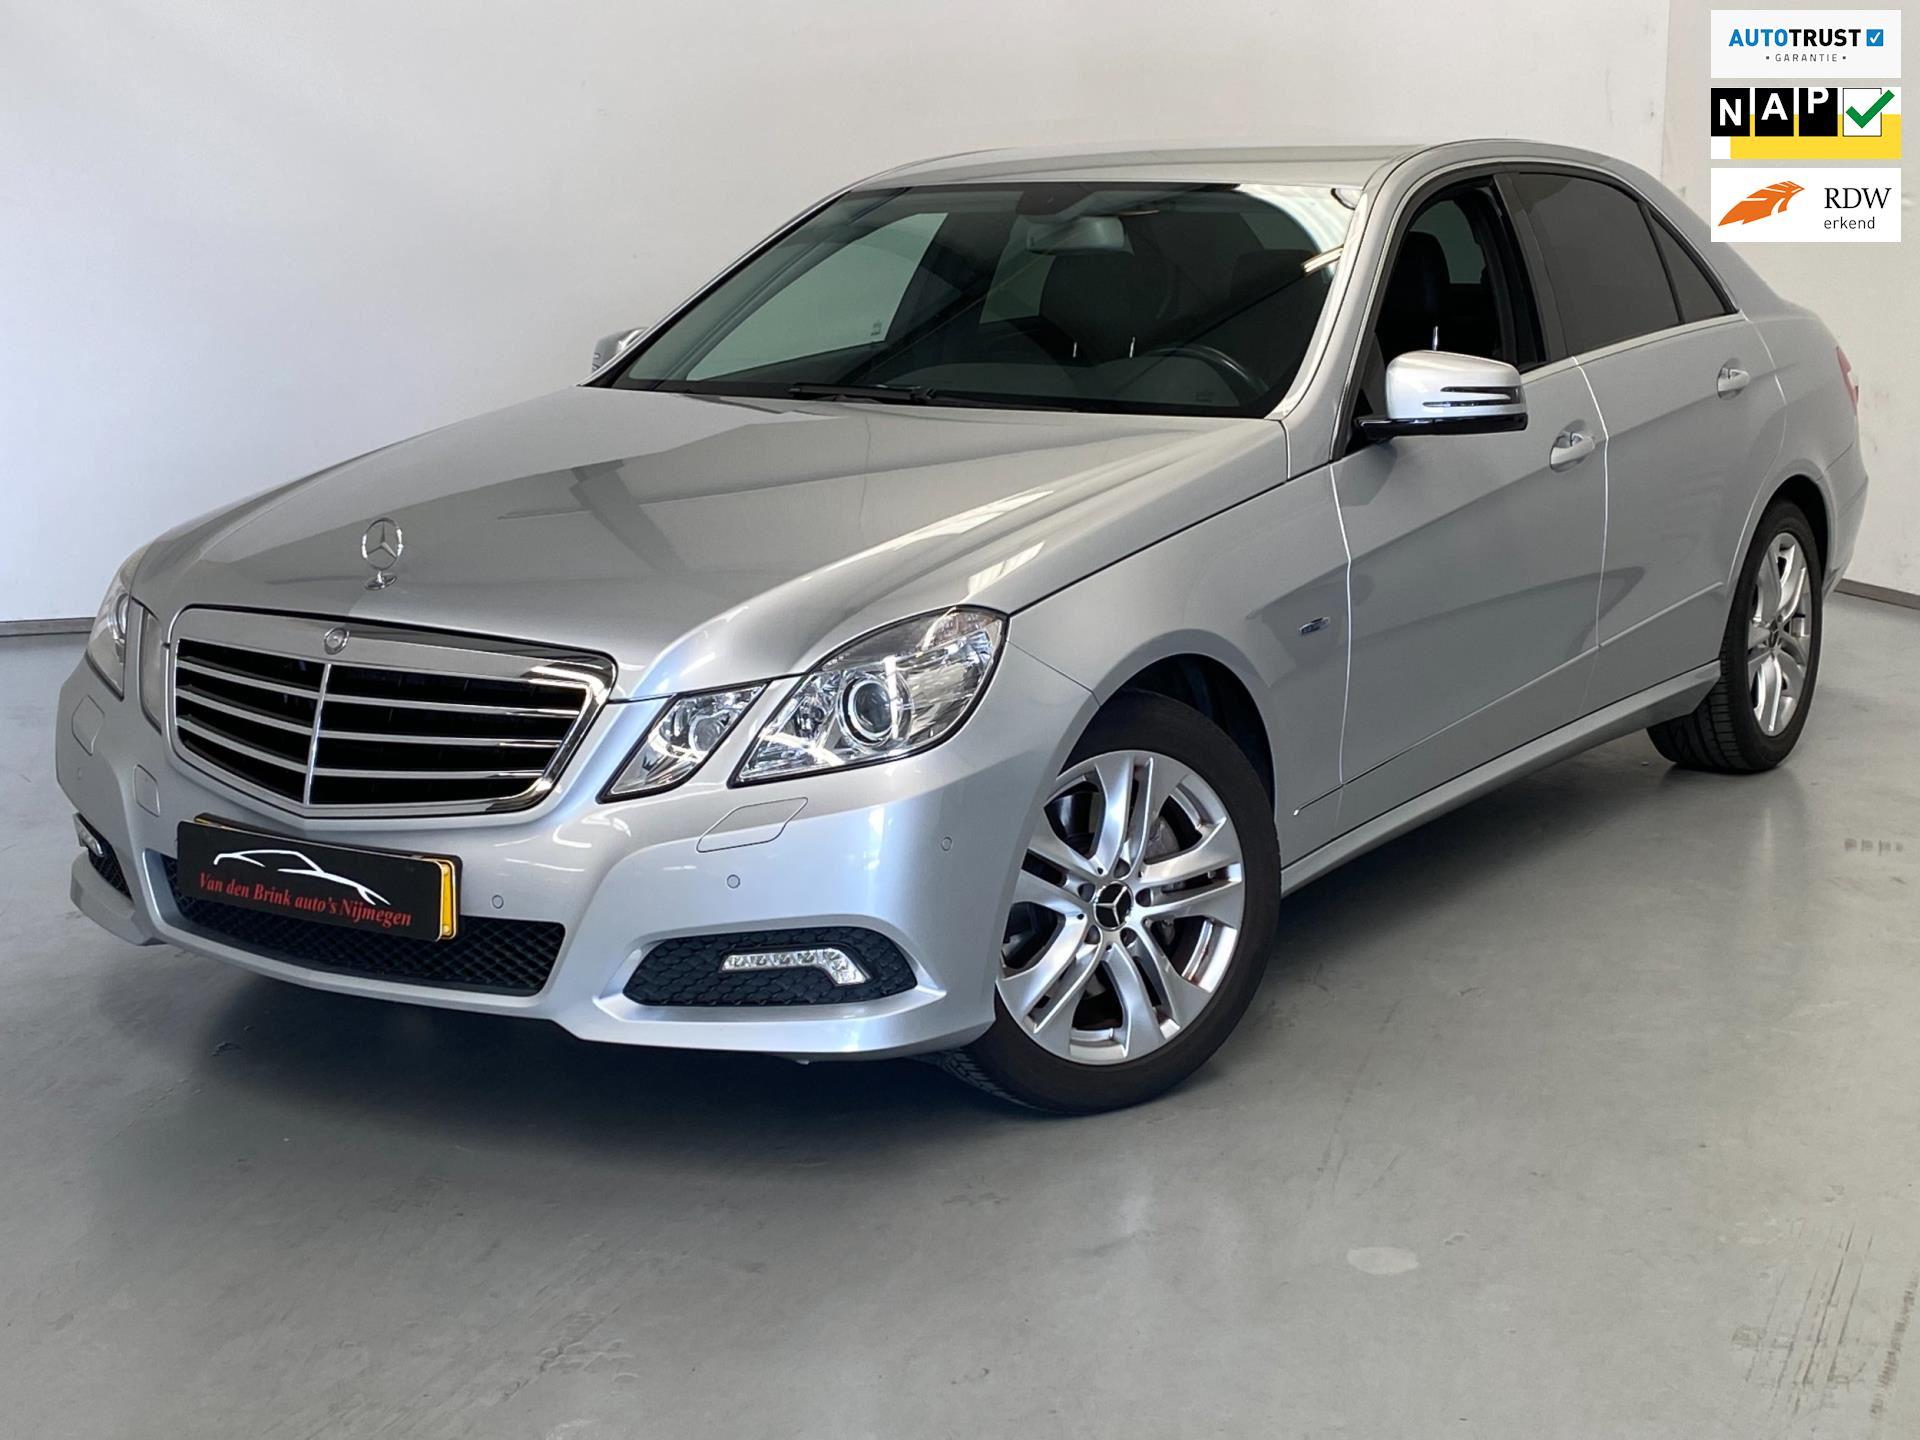 Mercedes-Benz E-klasse occasion - Van den Brink Auto's